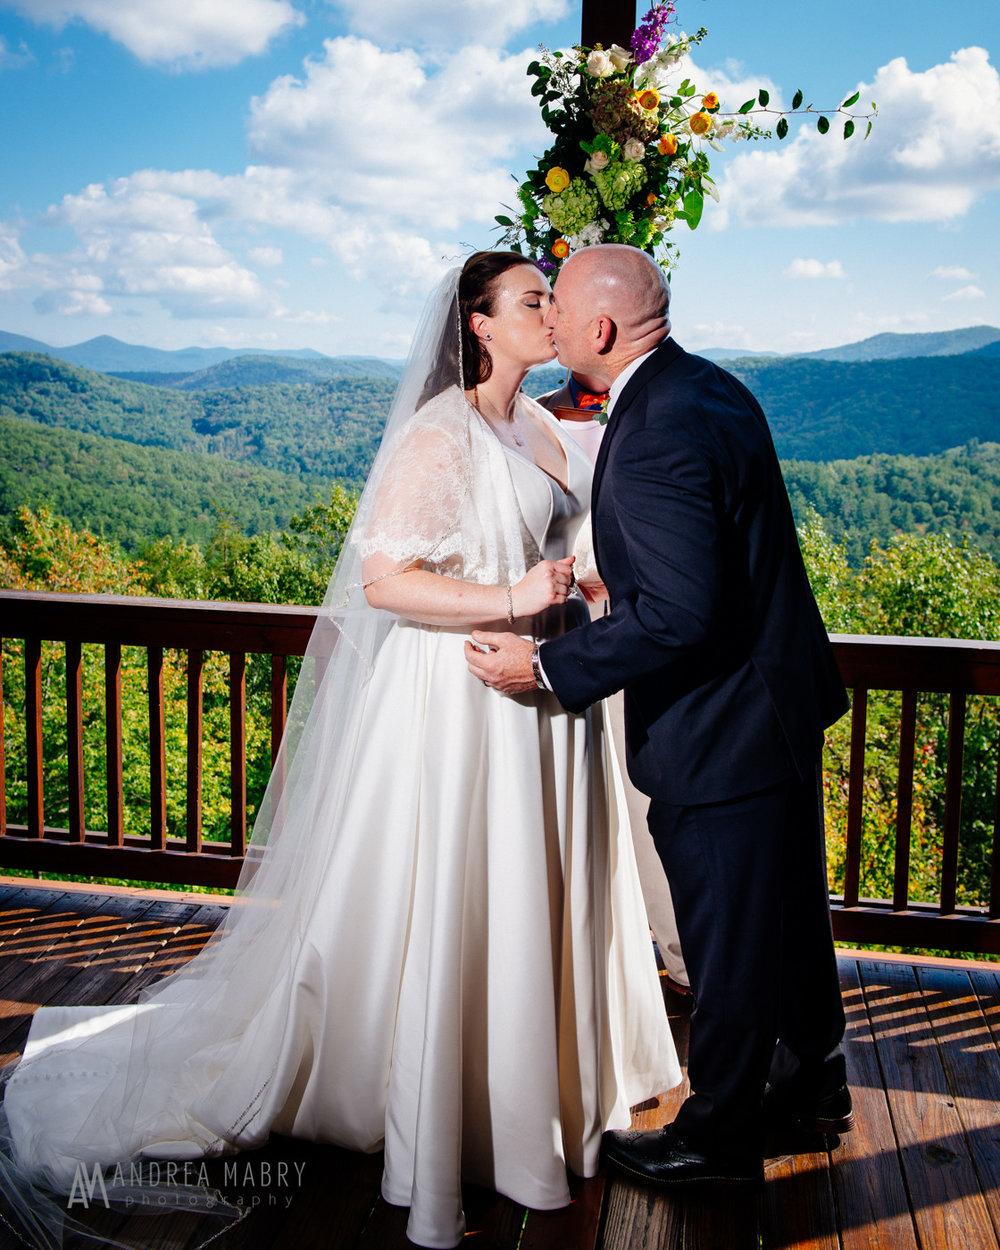 scott-wed-blog-mabry-021-8506.jpg